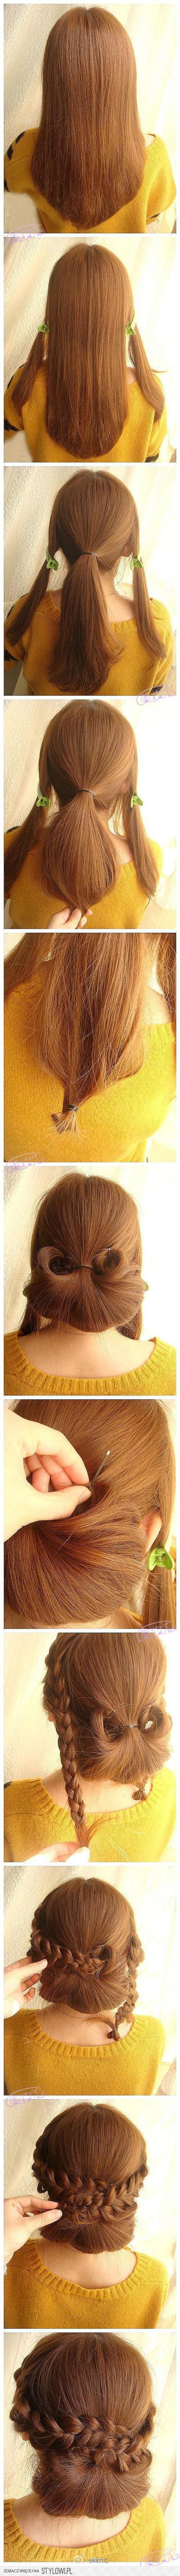 odkrywaj kolekcjonuj inspiruj hair pinterest coiffure cheveux et chignon. Black Bedroom Furniture Sets. Home Design Ideas